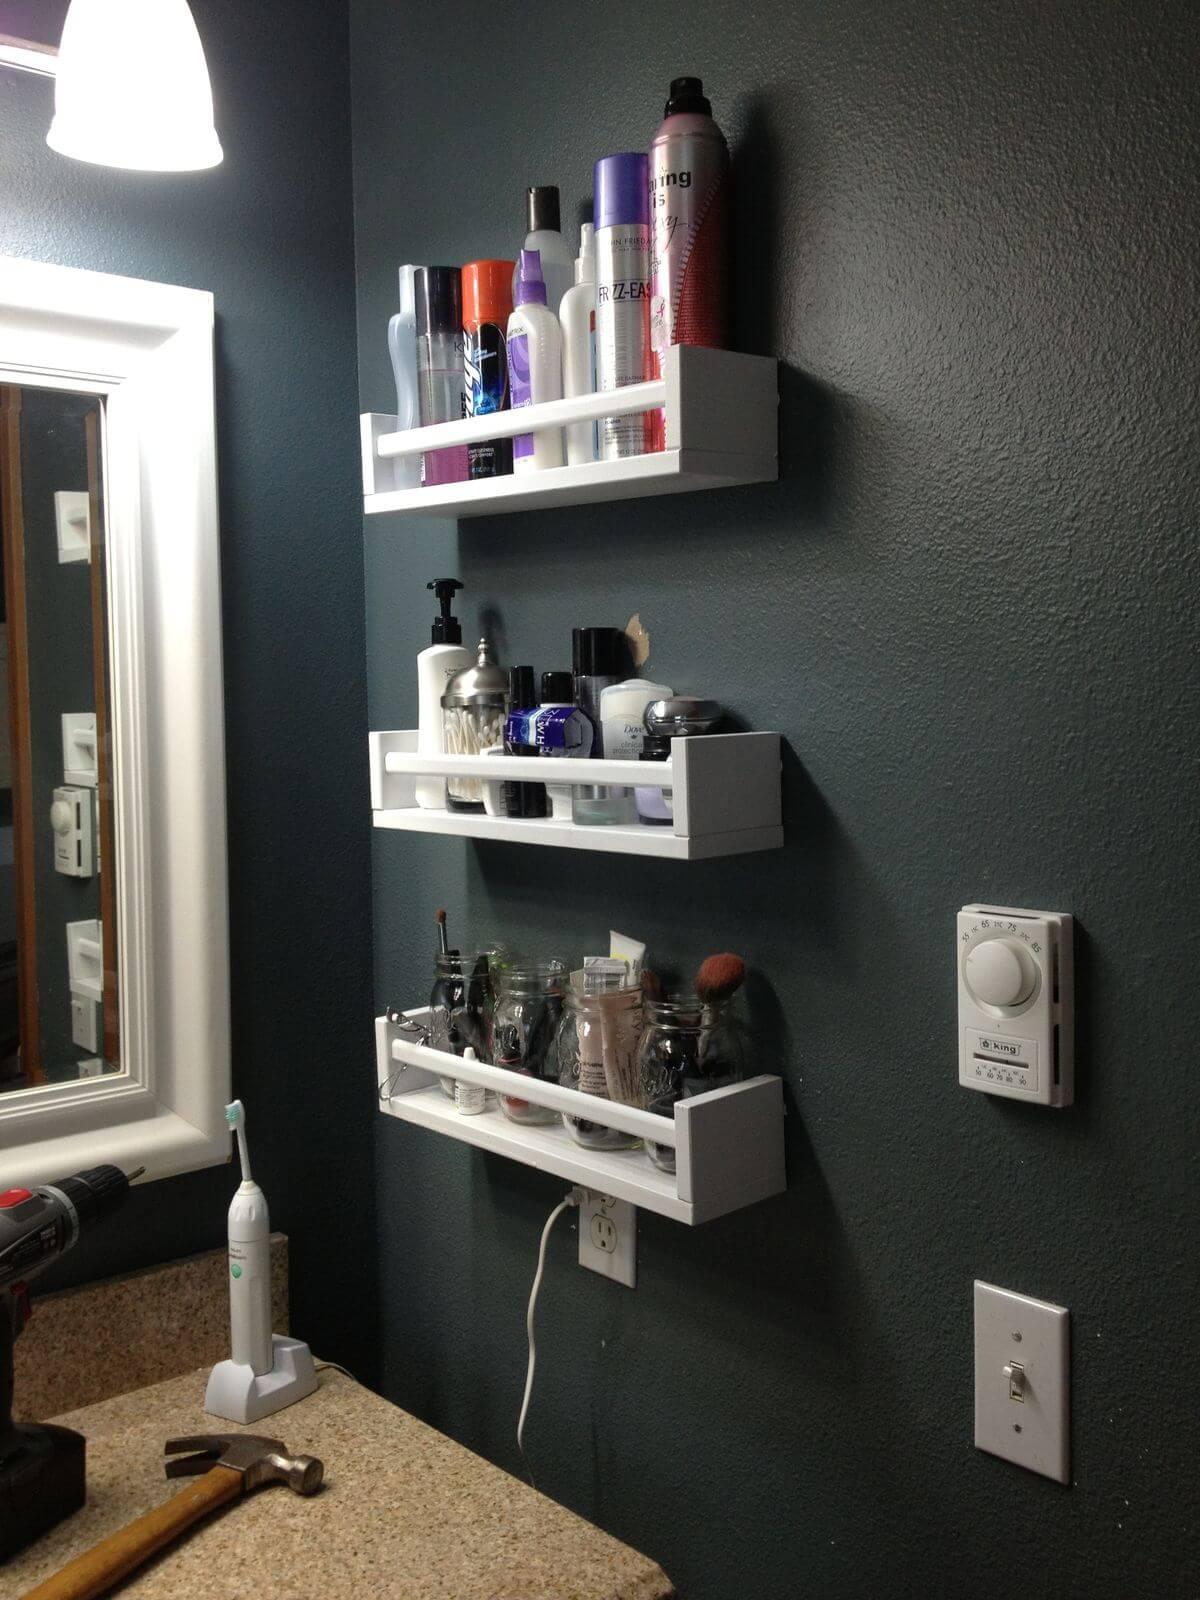 10-small-bathroom-storage-ideas-homebnc